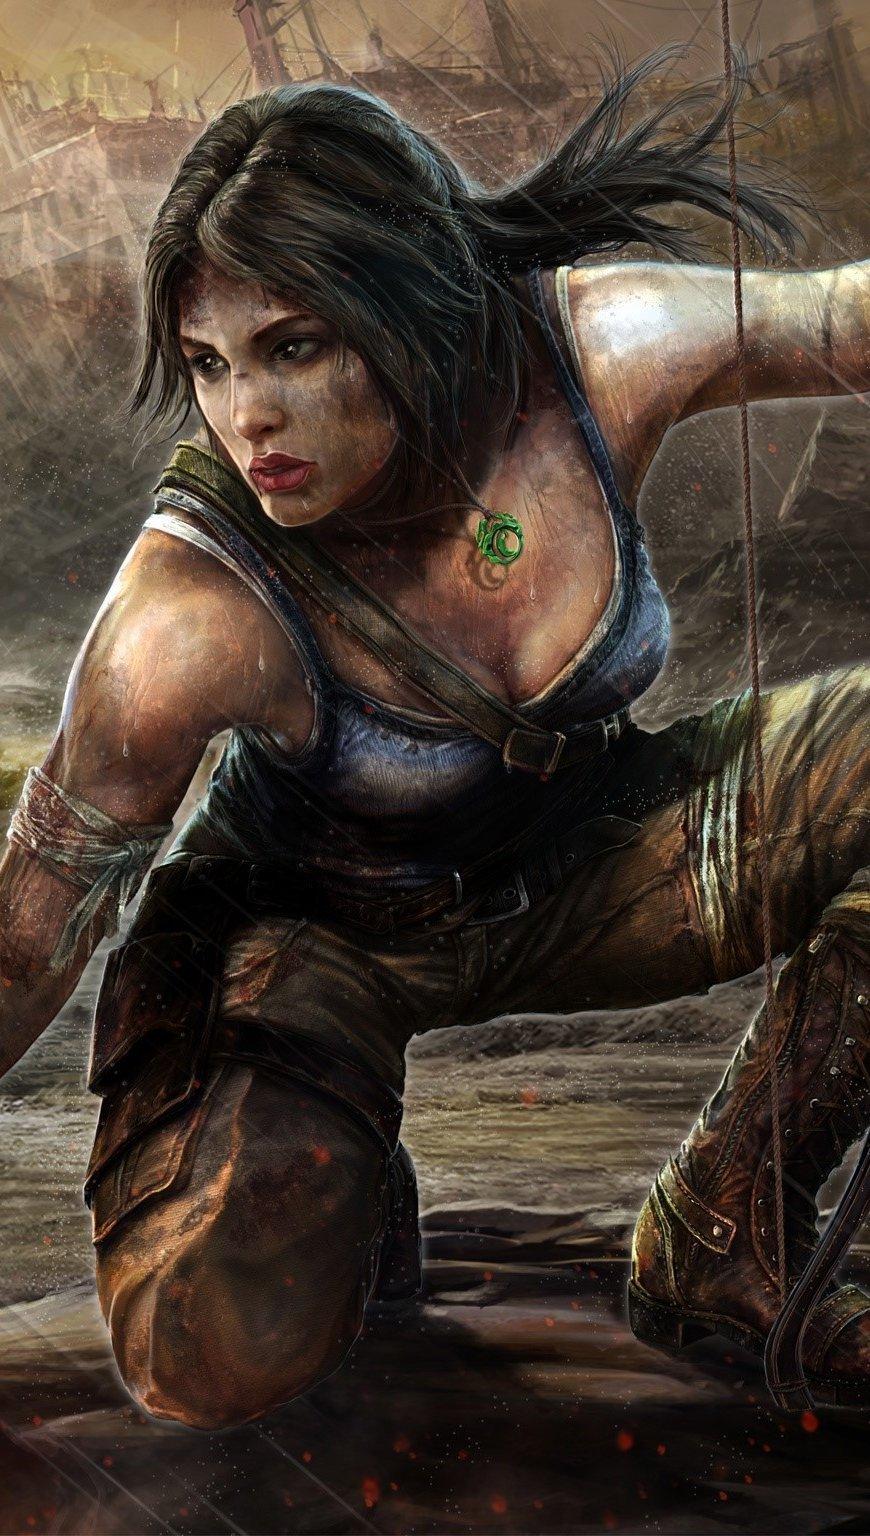 Wallpaper Drawing of Lara Croft Tomb Raider Vertical